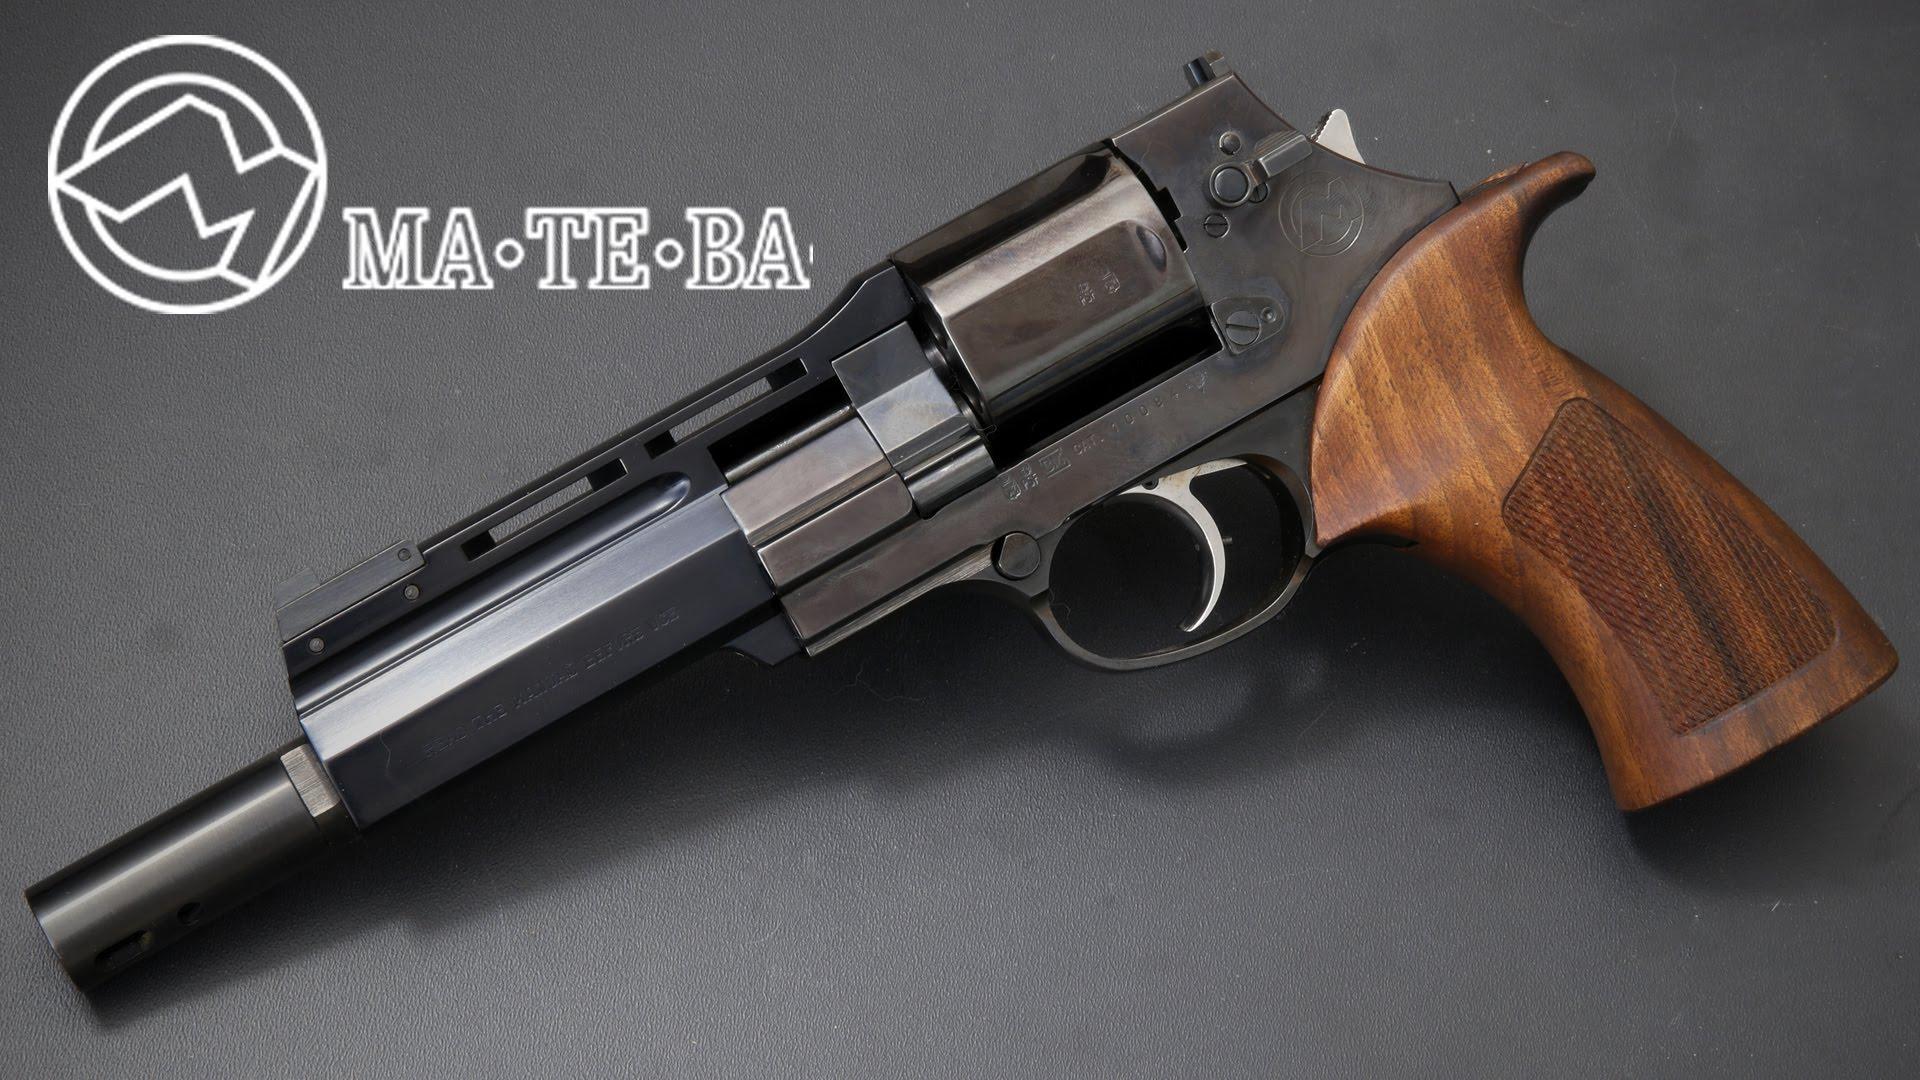 1920x1080 > Mateba Unica Revolver Wallpapers